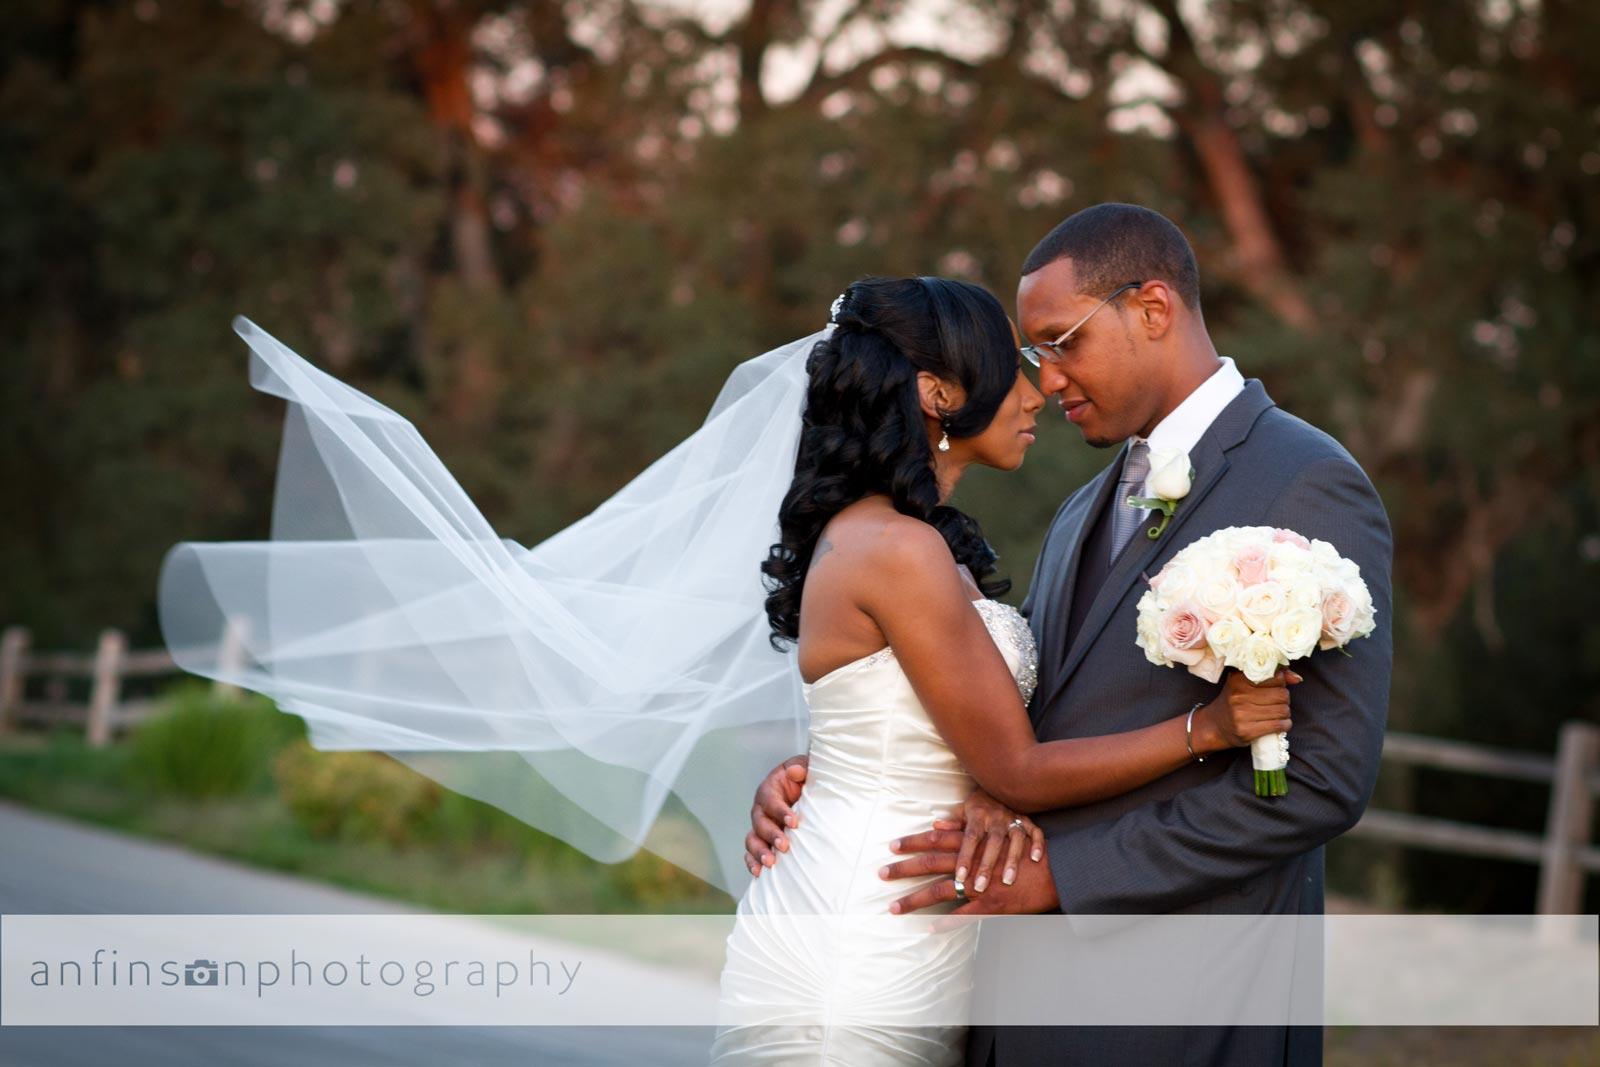 10 Odd Wedding Traditions Around The World - The Trent